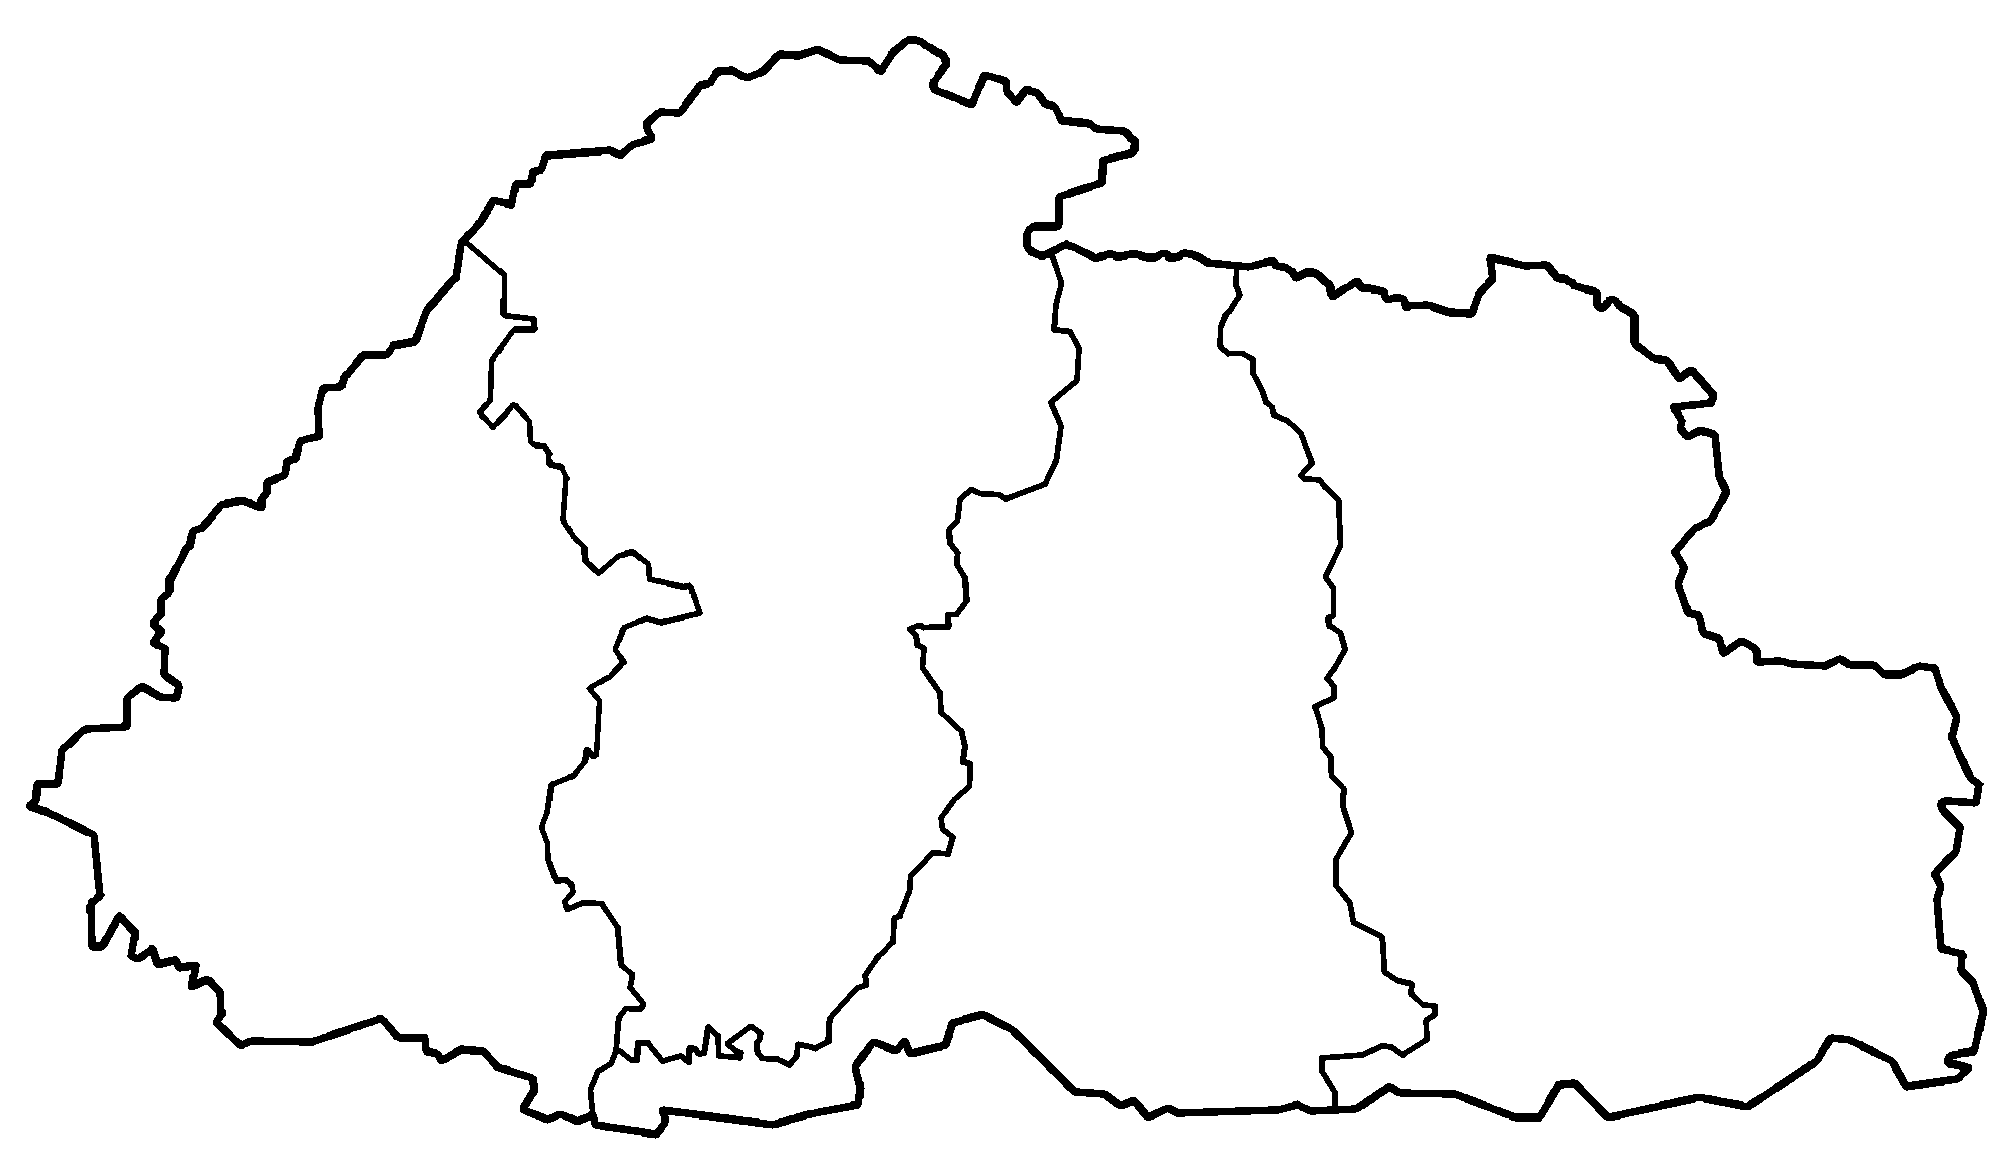 Bhutan Zones Blank • Mapsof.net